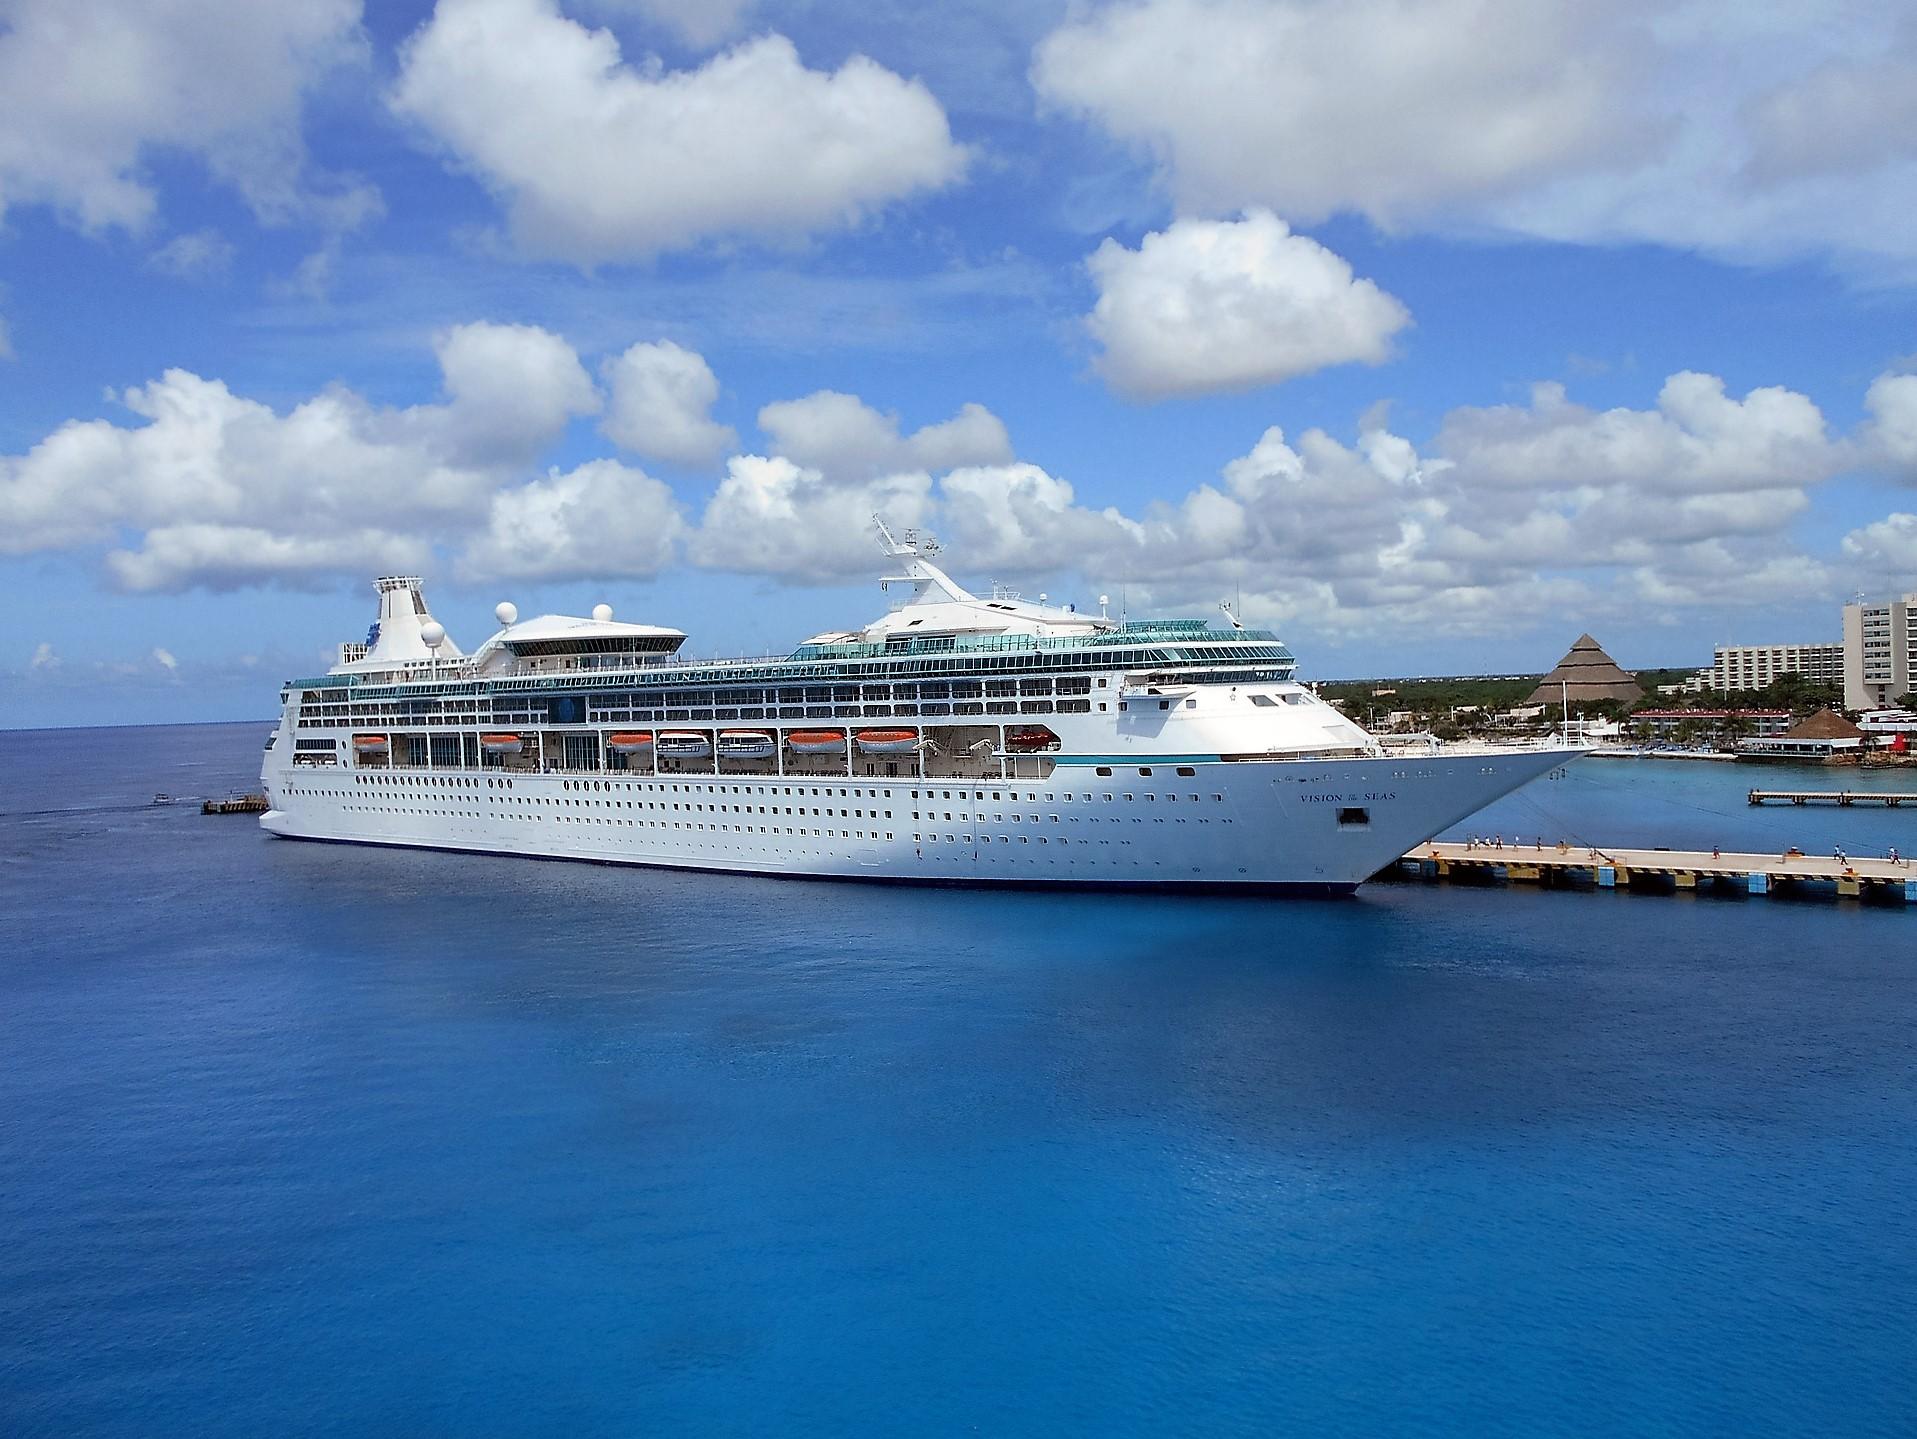 Cozumel My Cozumel cruise ship schedule